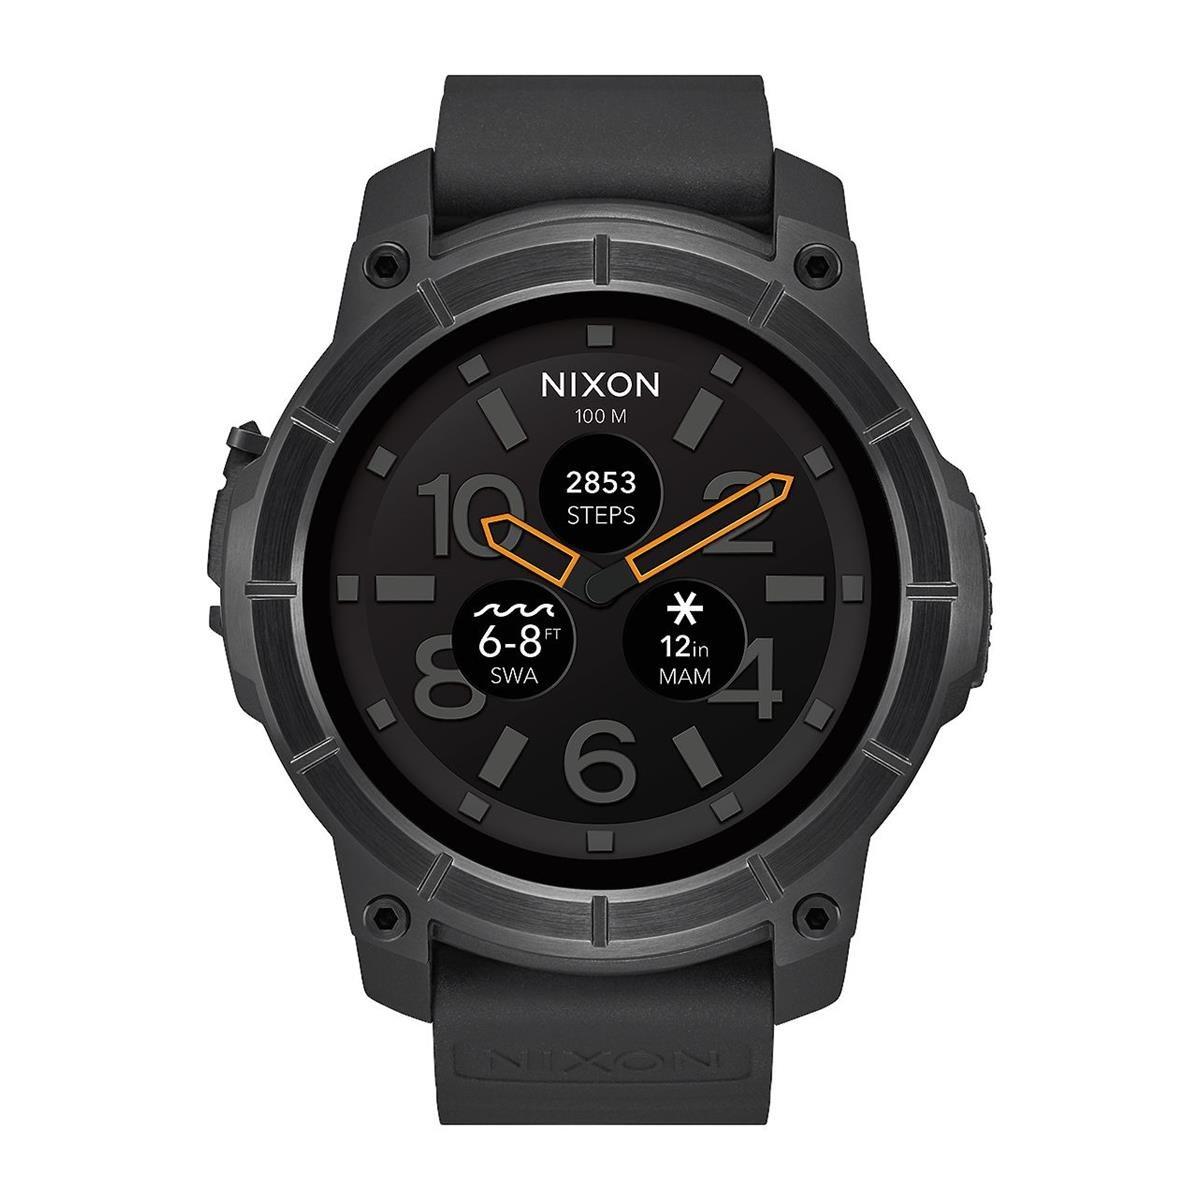 Nixon Hombre Deporte Smart Watch a1167